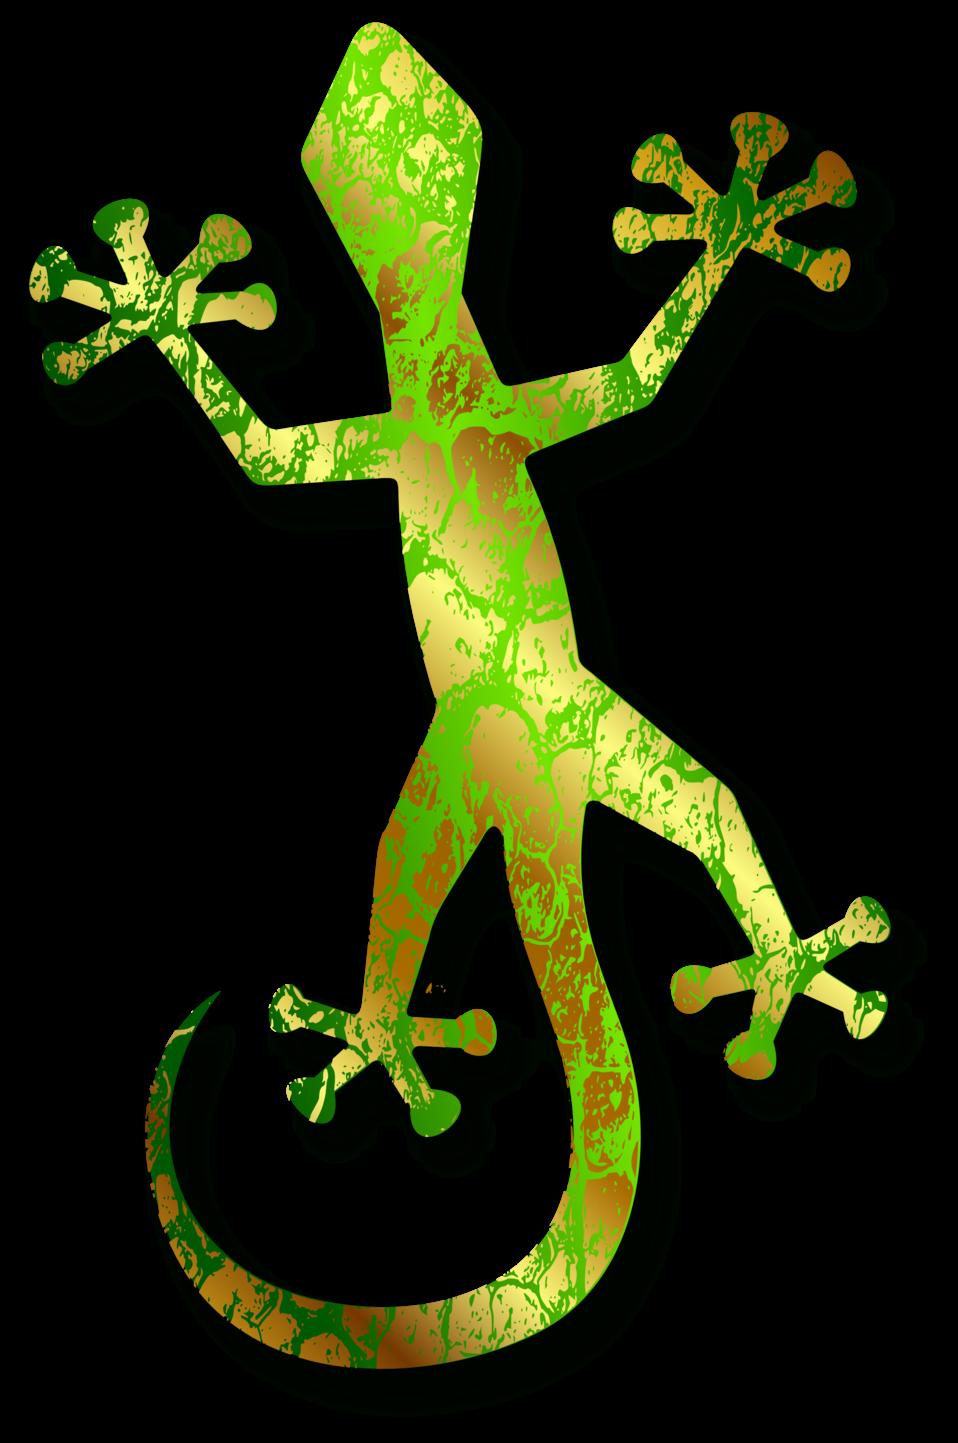 Public domain clip art. Gecko clipart small lizard